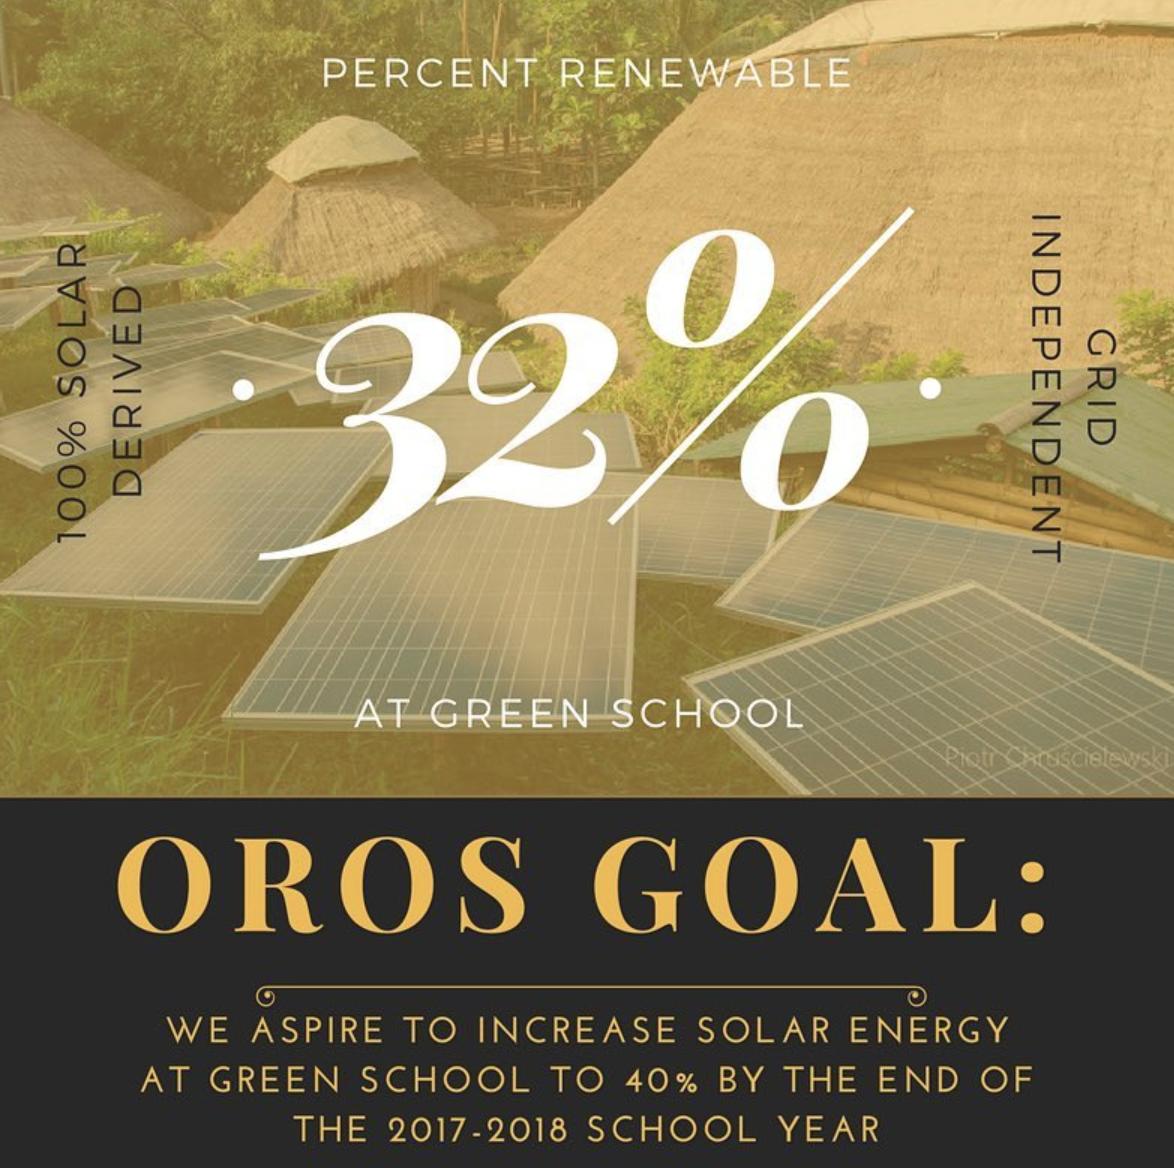 OROS Goal for Green School